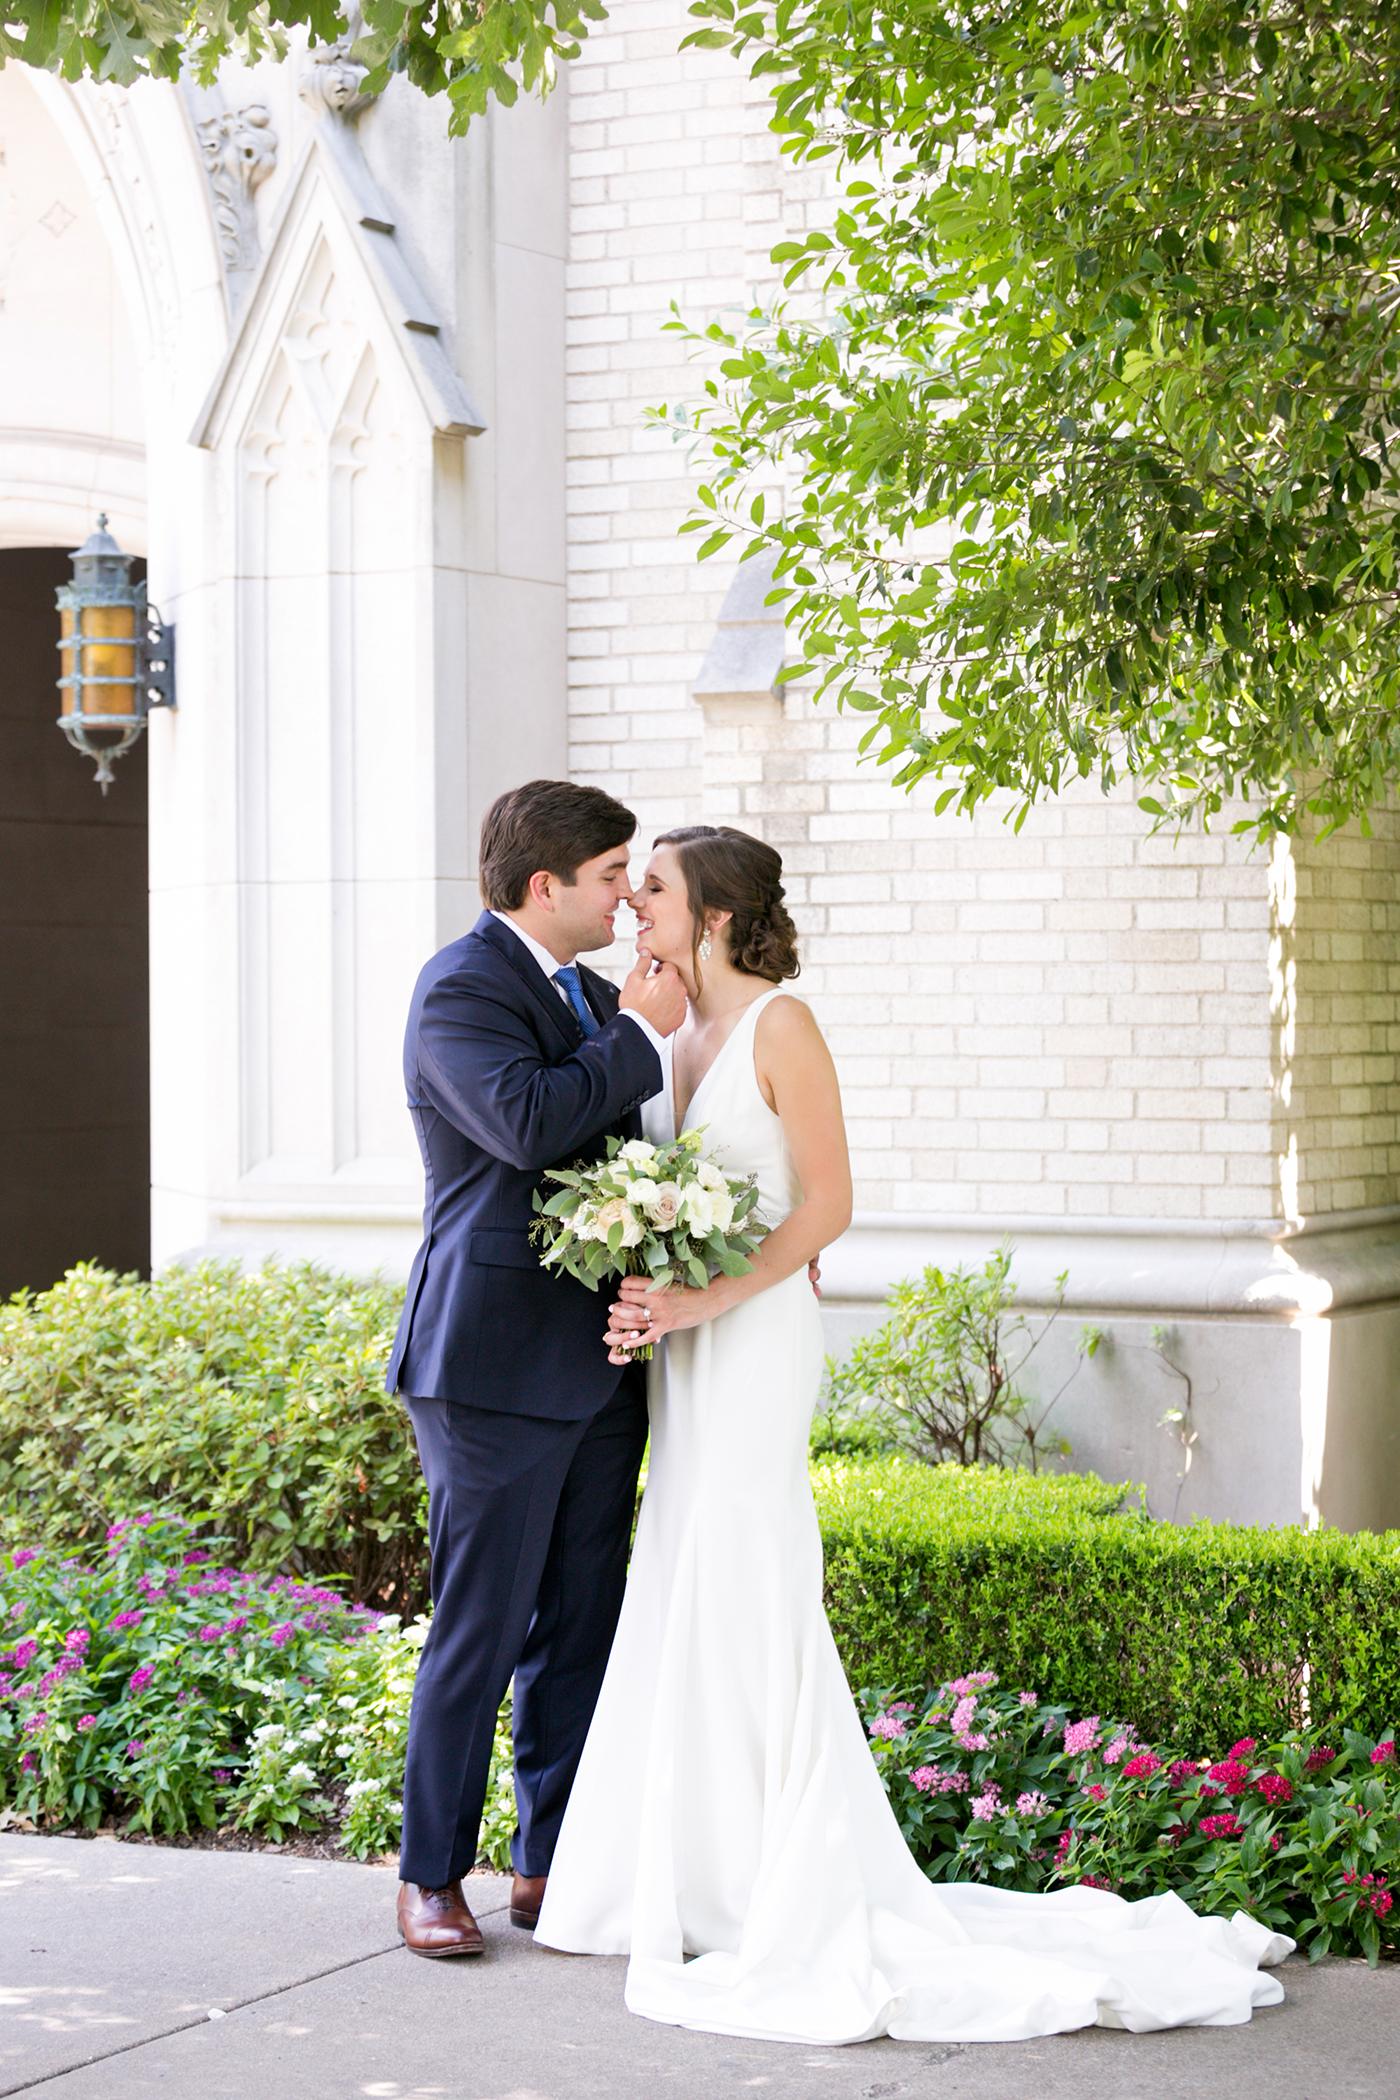 Wedding Planner Dallas TX - Allday Events - Highland Park - Marie Gabrielle Wedding - 175.jpg